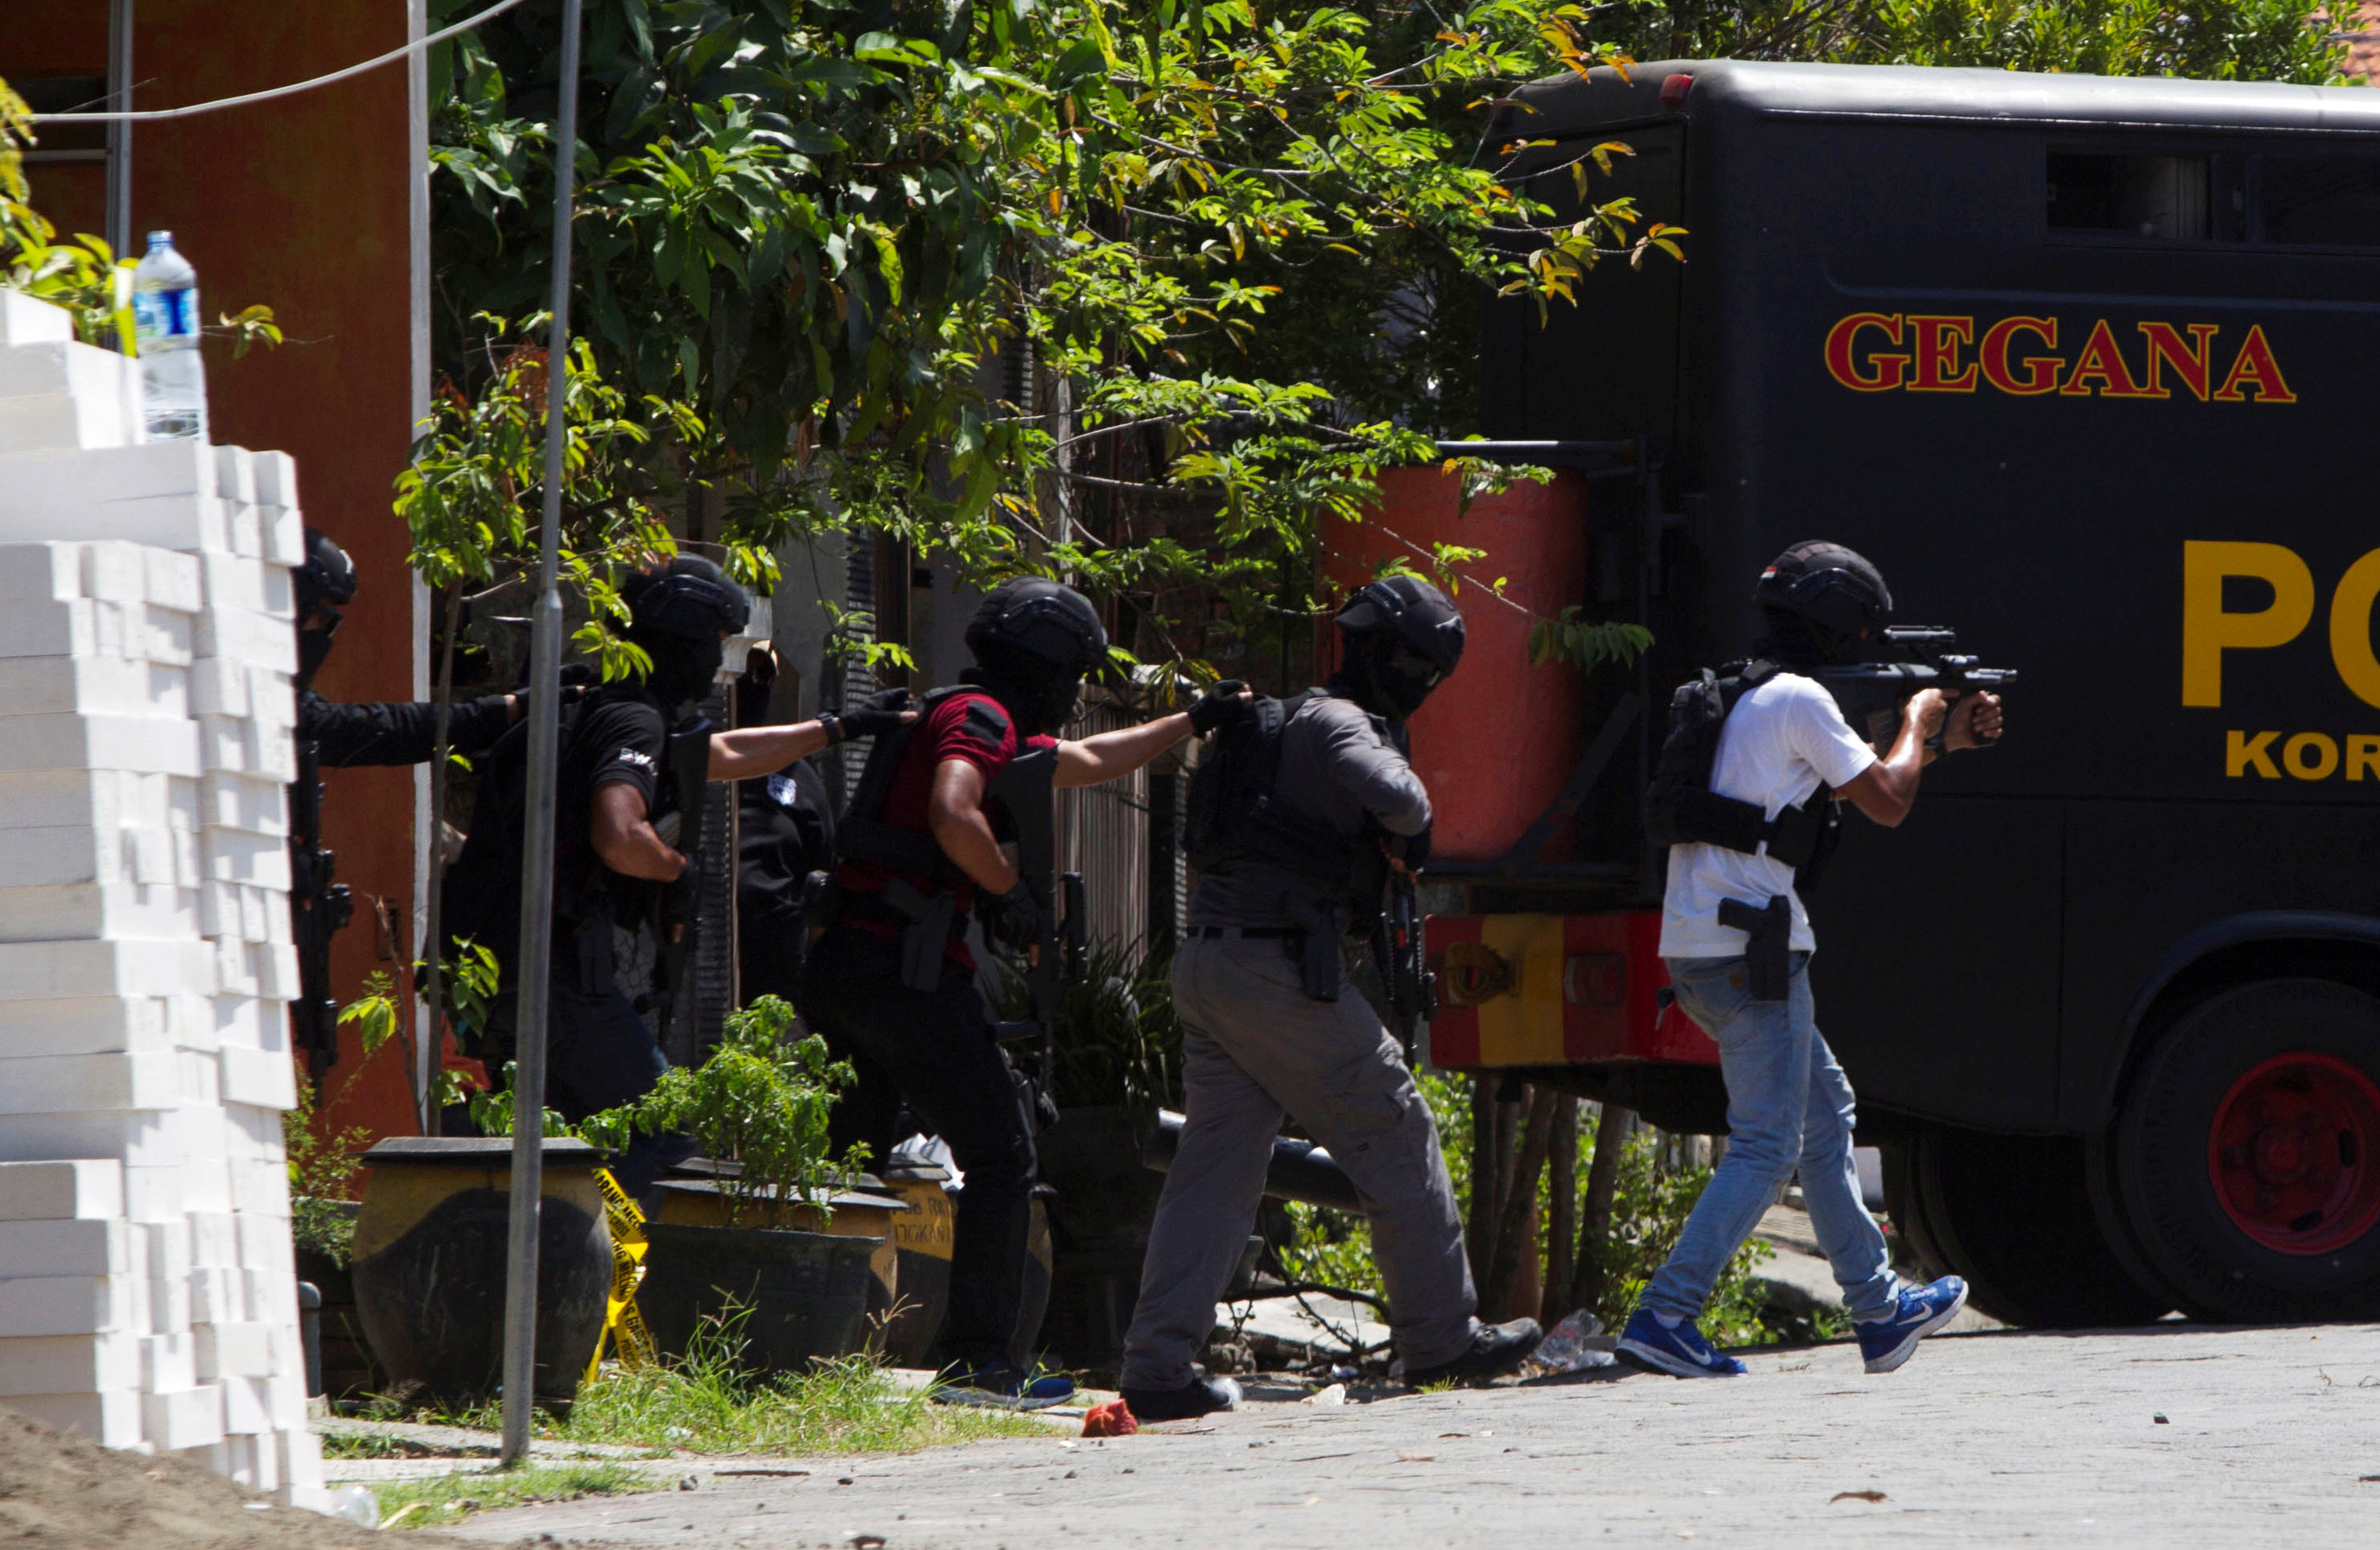 Anti-terror policemen walk during a raid of a house of a suspected terrorist at Medokan Ayu area in Surabaya, Indonesia May 15, 2018. REUTERS/Sigit Pamungkas